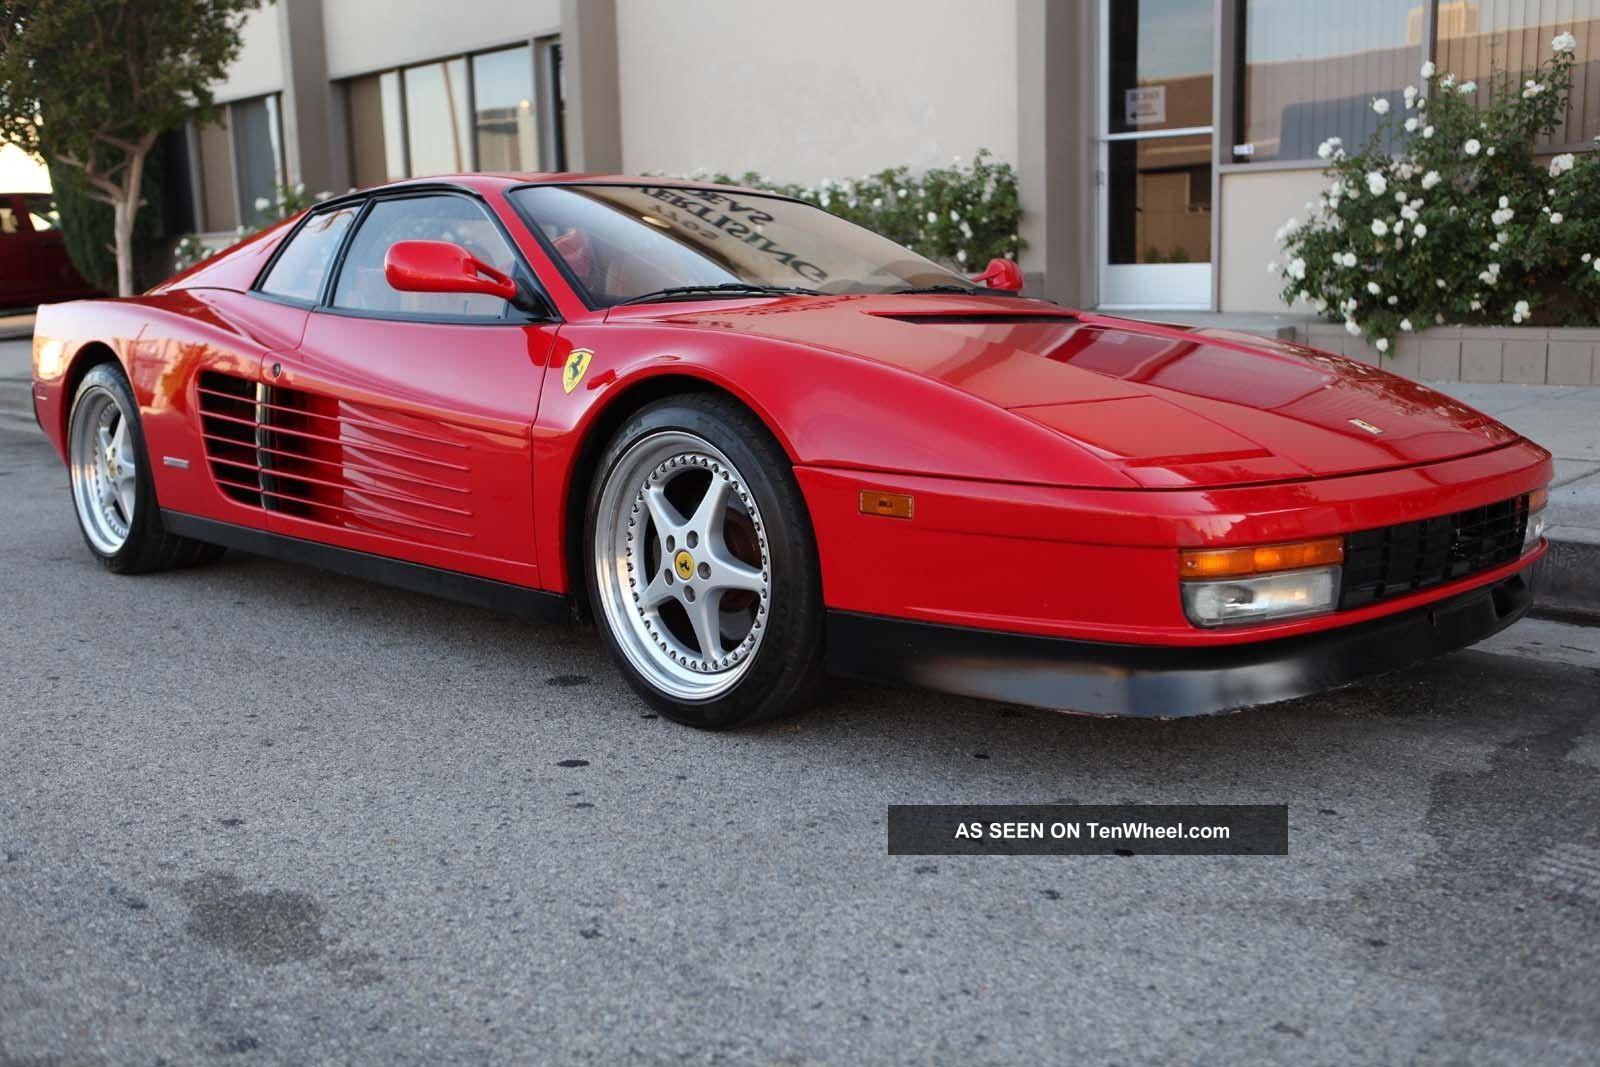 1991 Ferrari Testarossa Calif Car Example Reasonable Reserve Testarossa photo